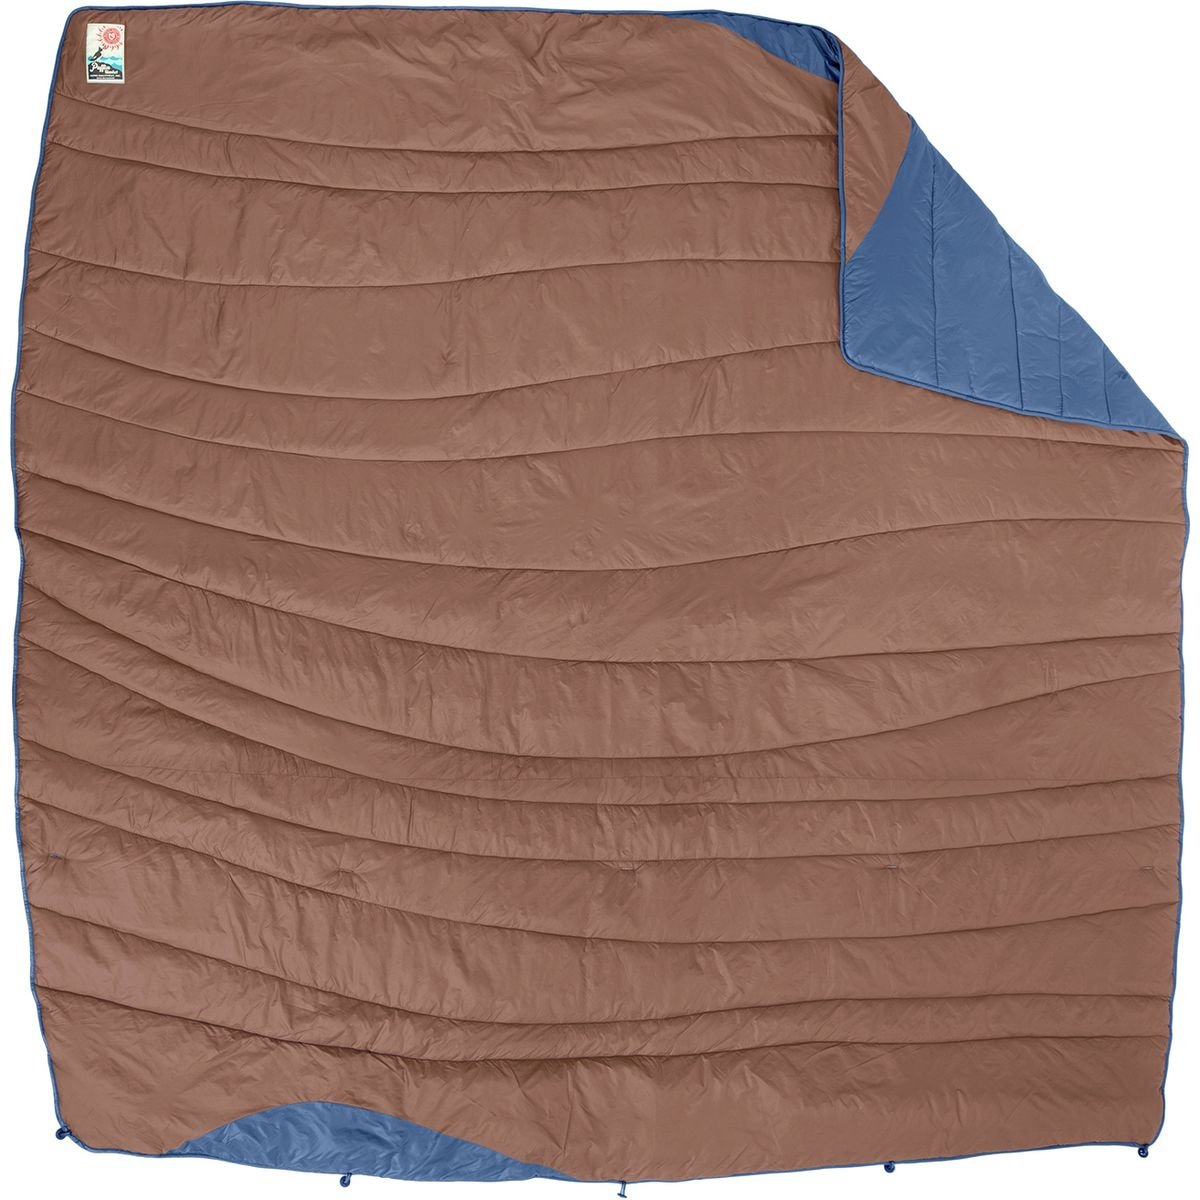 Amazon.com : Nemo Puffin Blanket : Sports & Outdoors